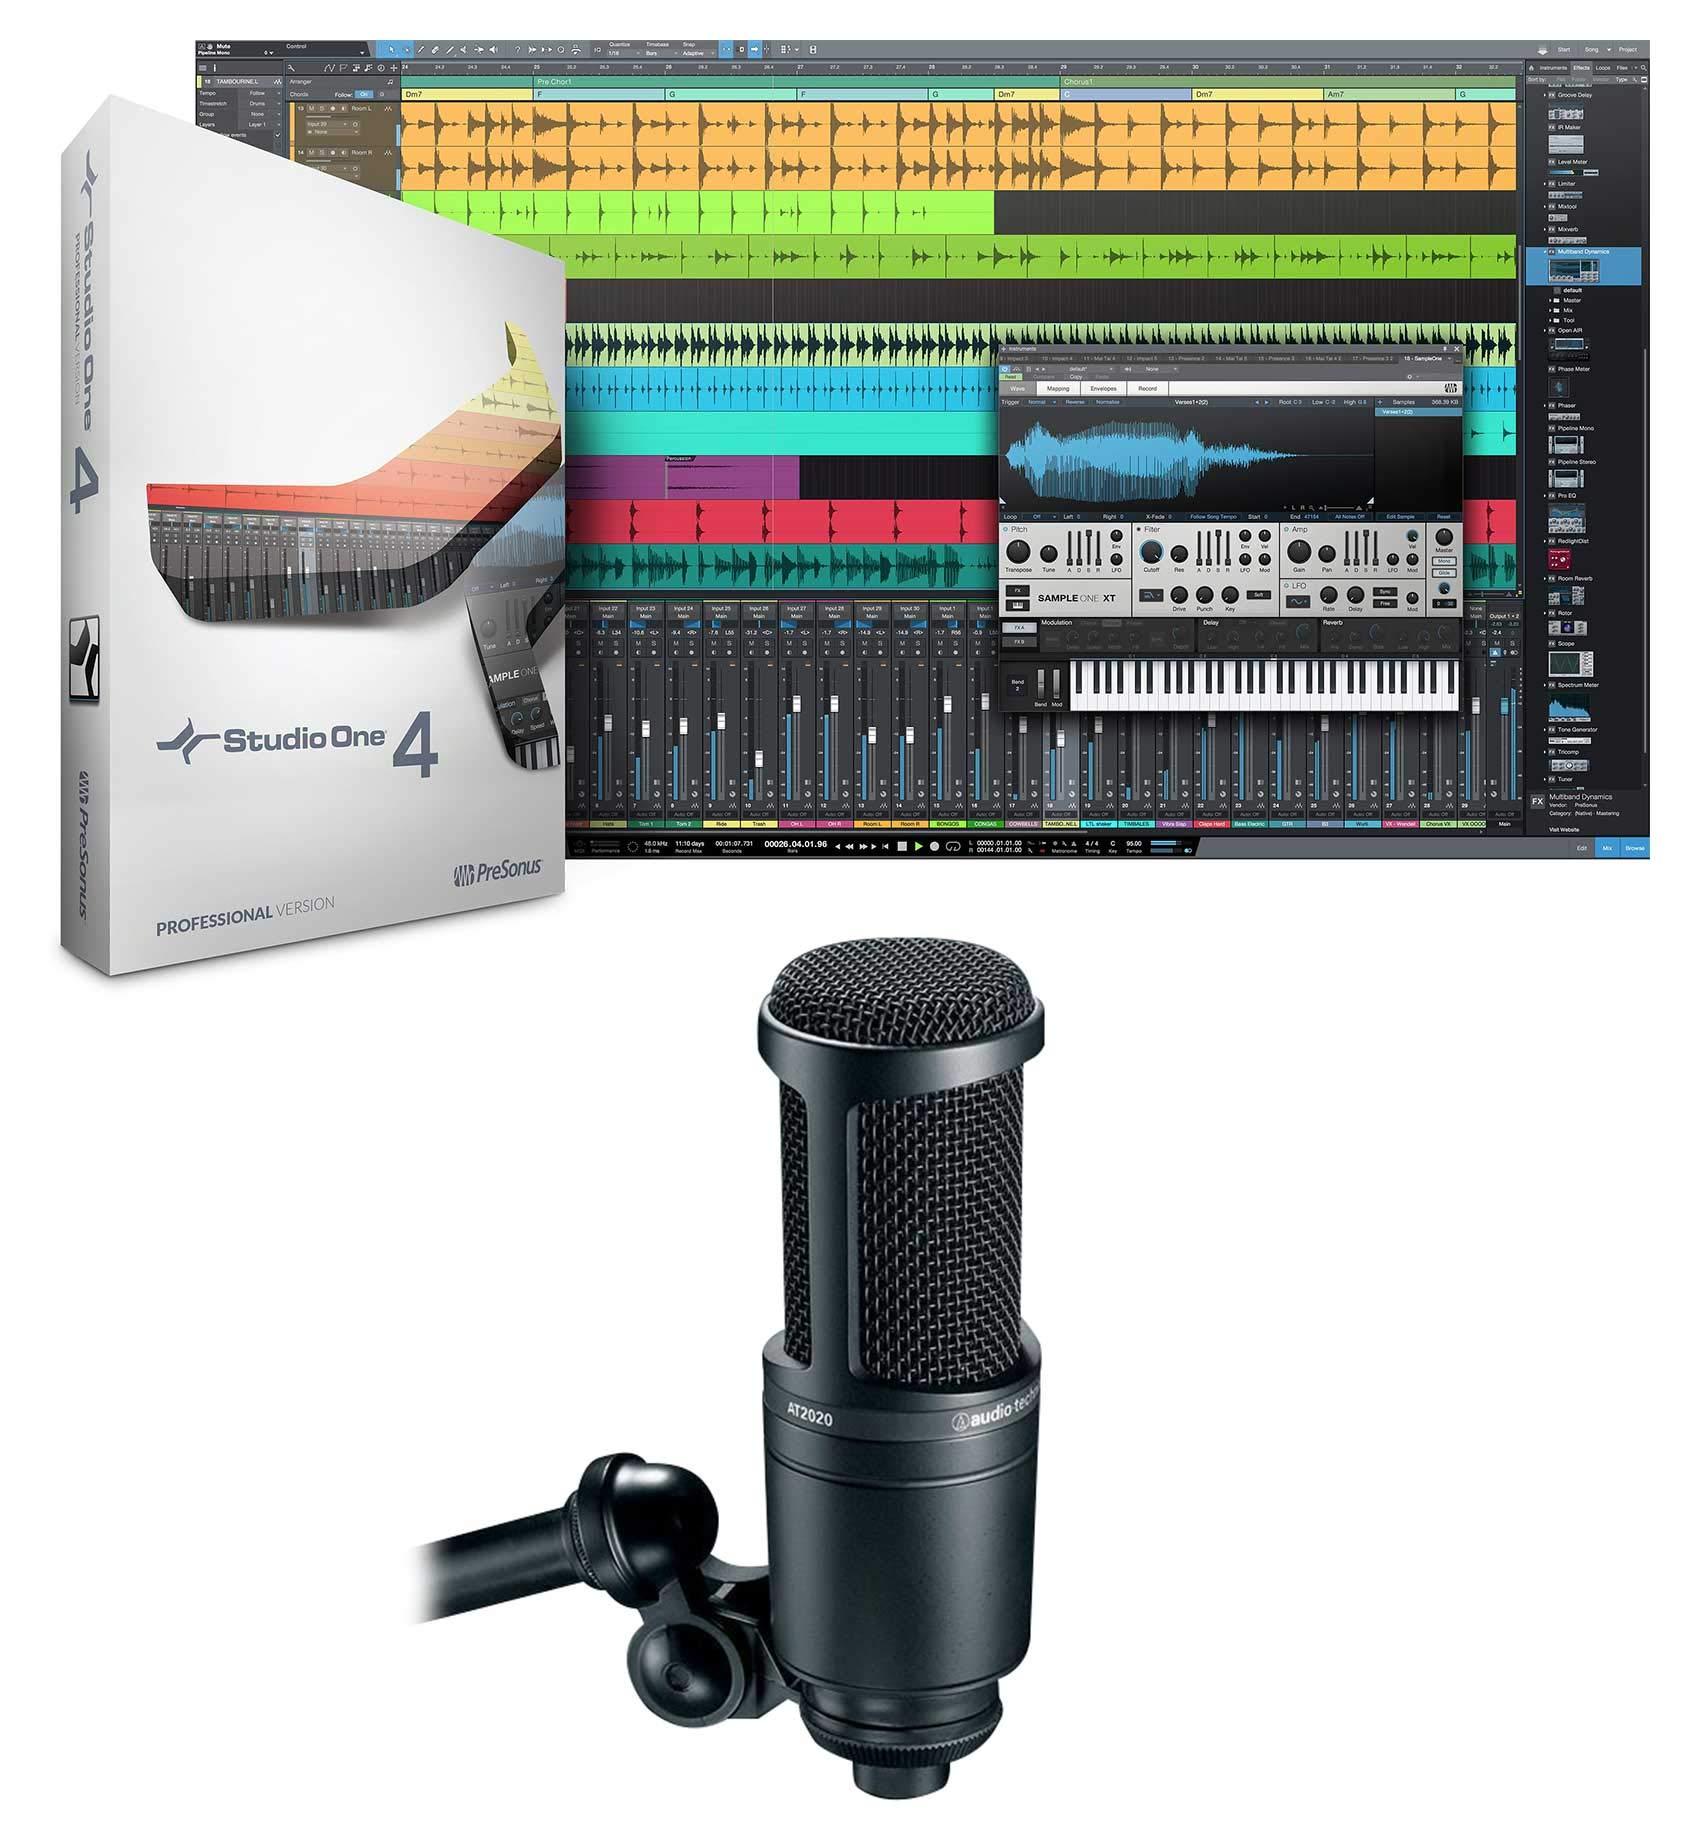 Presonus Studio One 4 Professional MIDI DAW Full Software + Audio Technica Mic by PreSonus